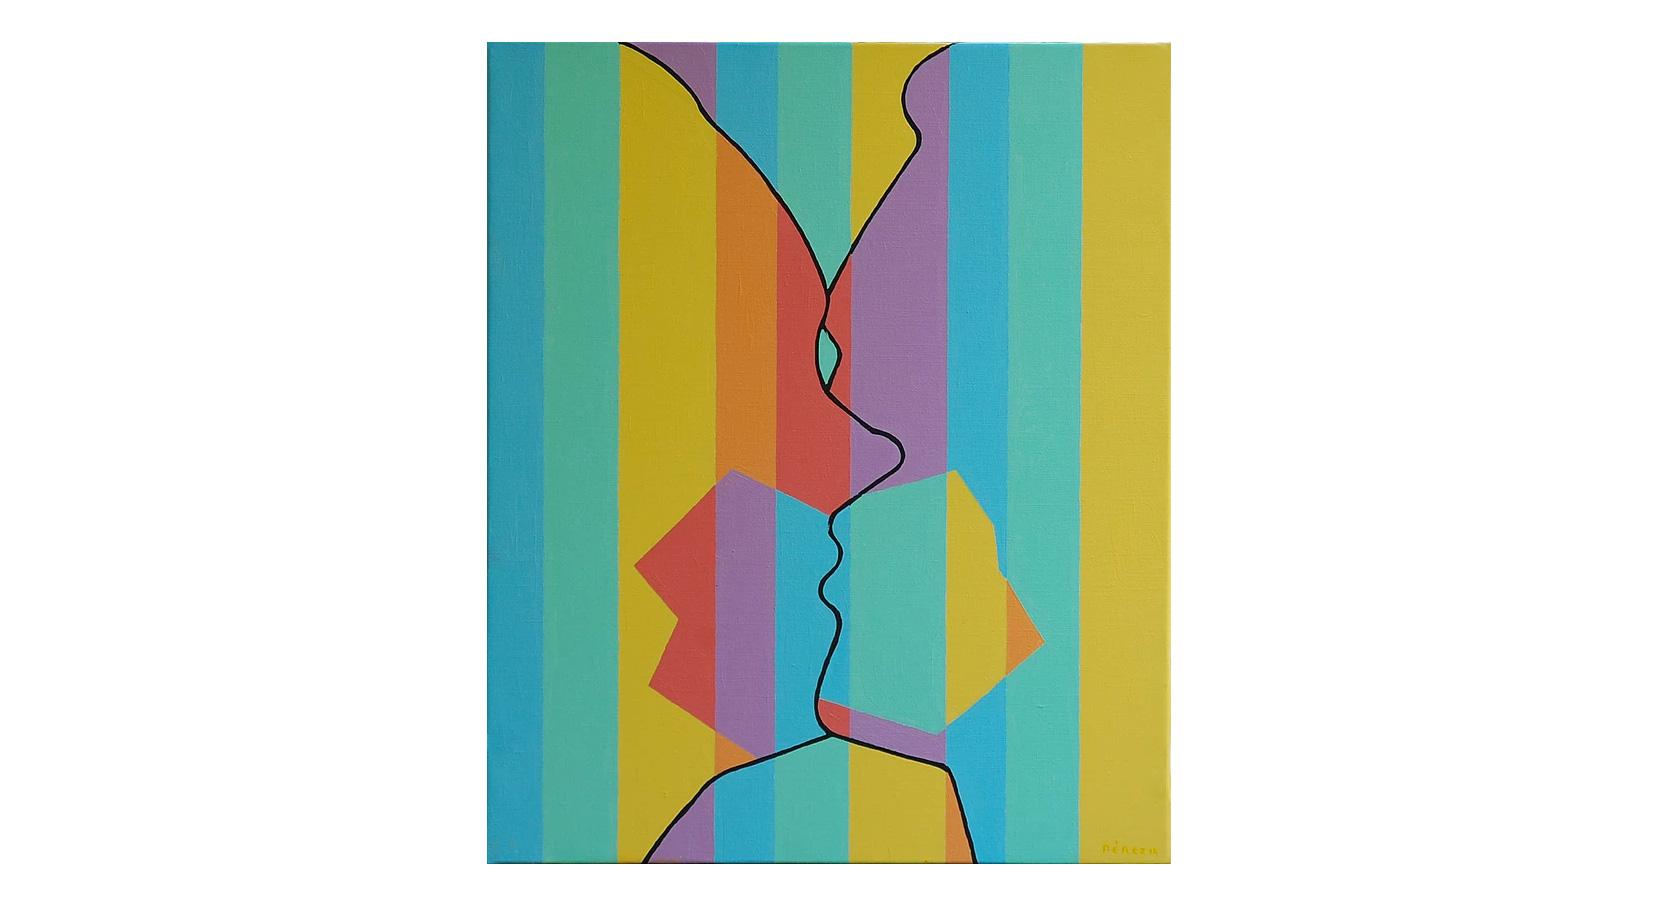 Le baiser 4